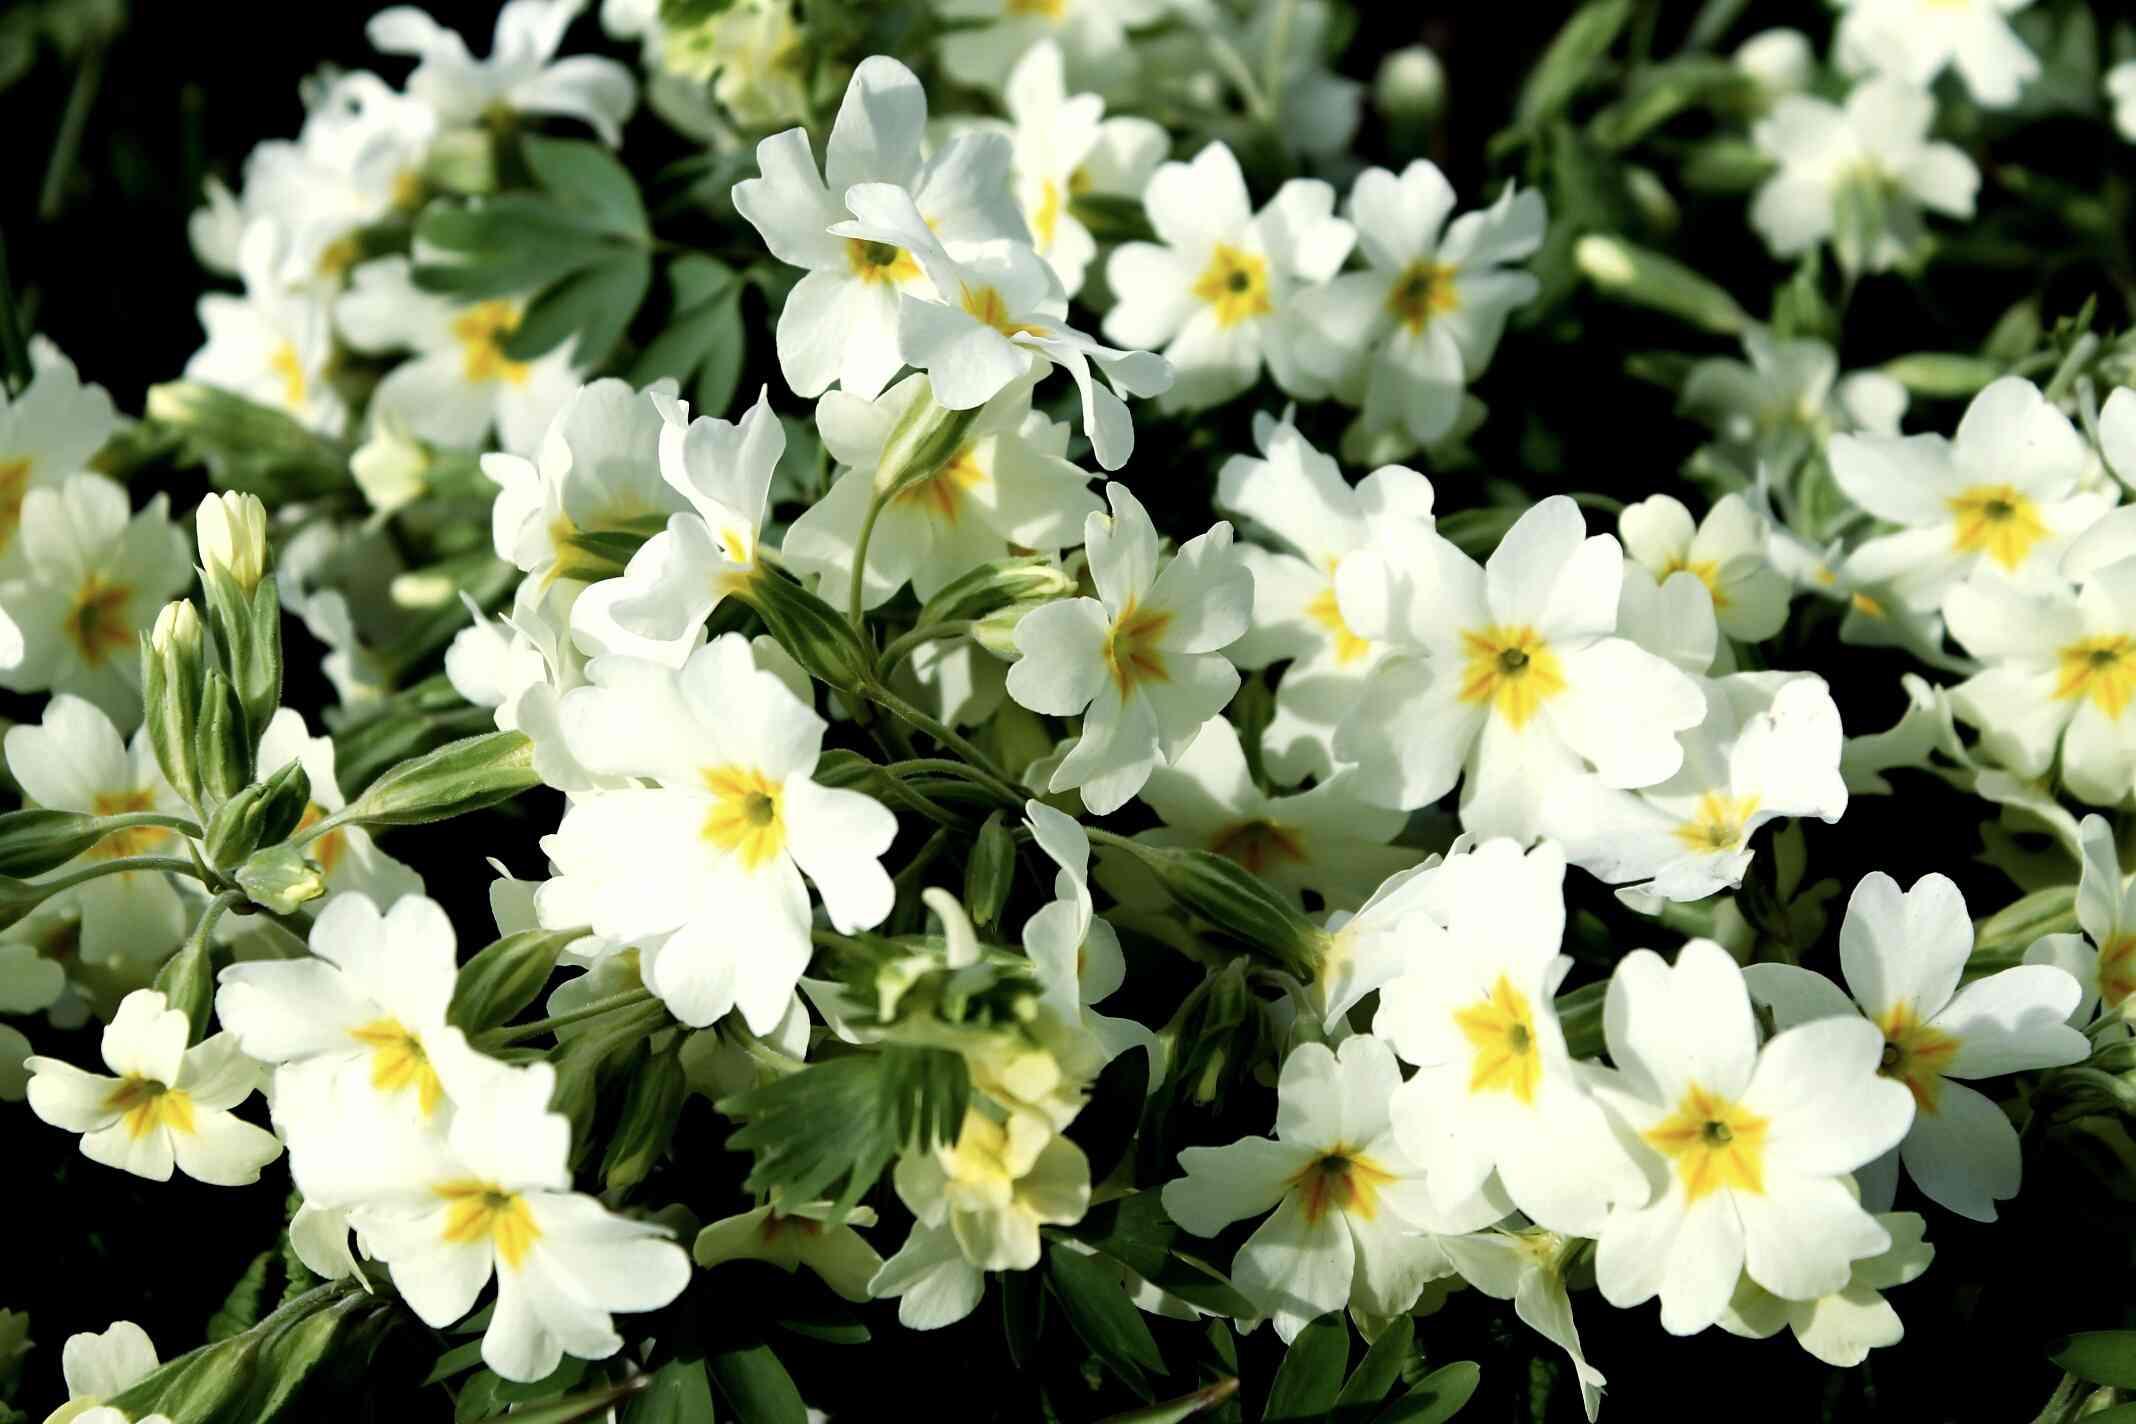 White primrose flowers.